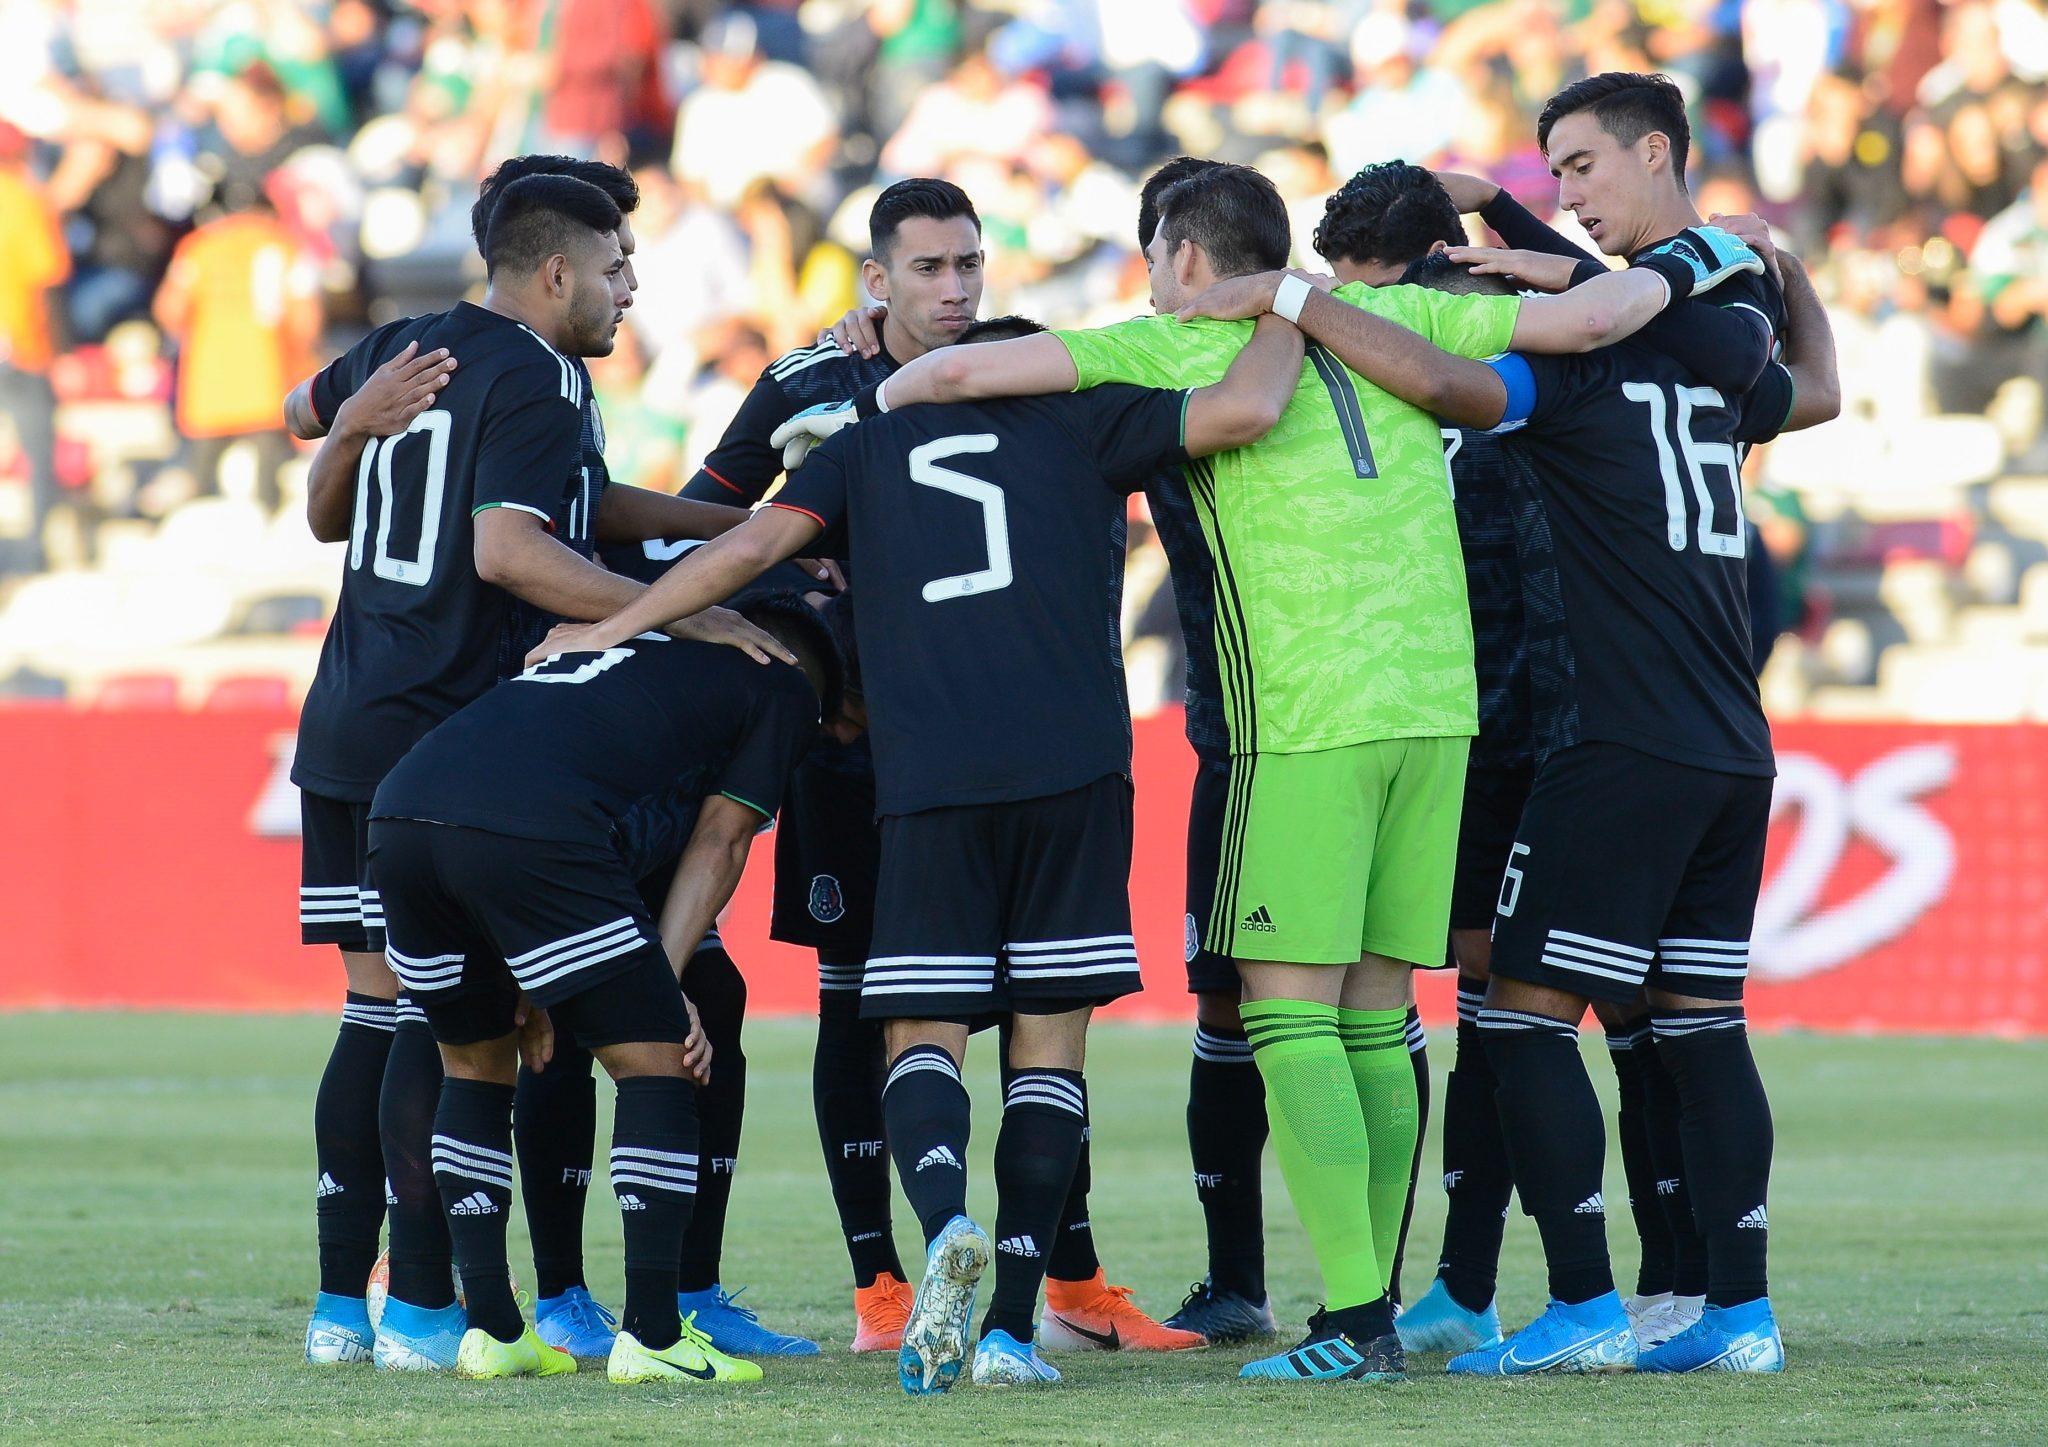 México empató con Argentina. Foto: Twitter